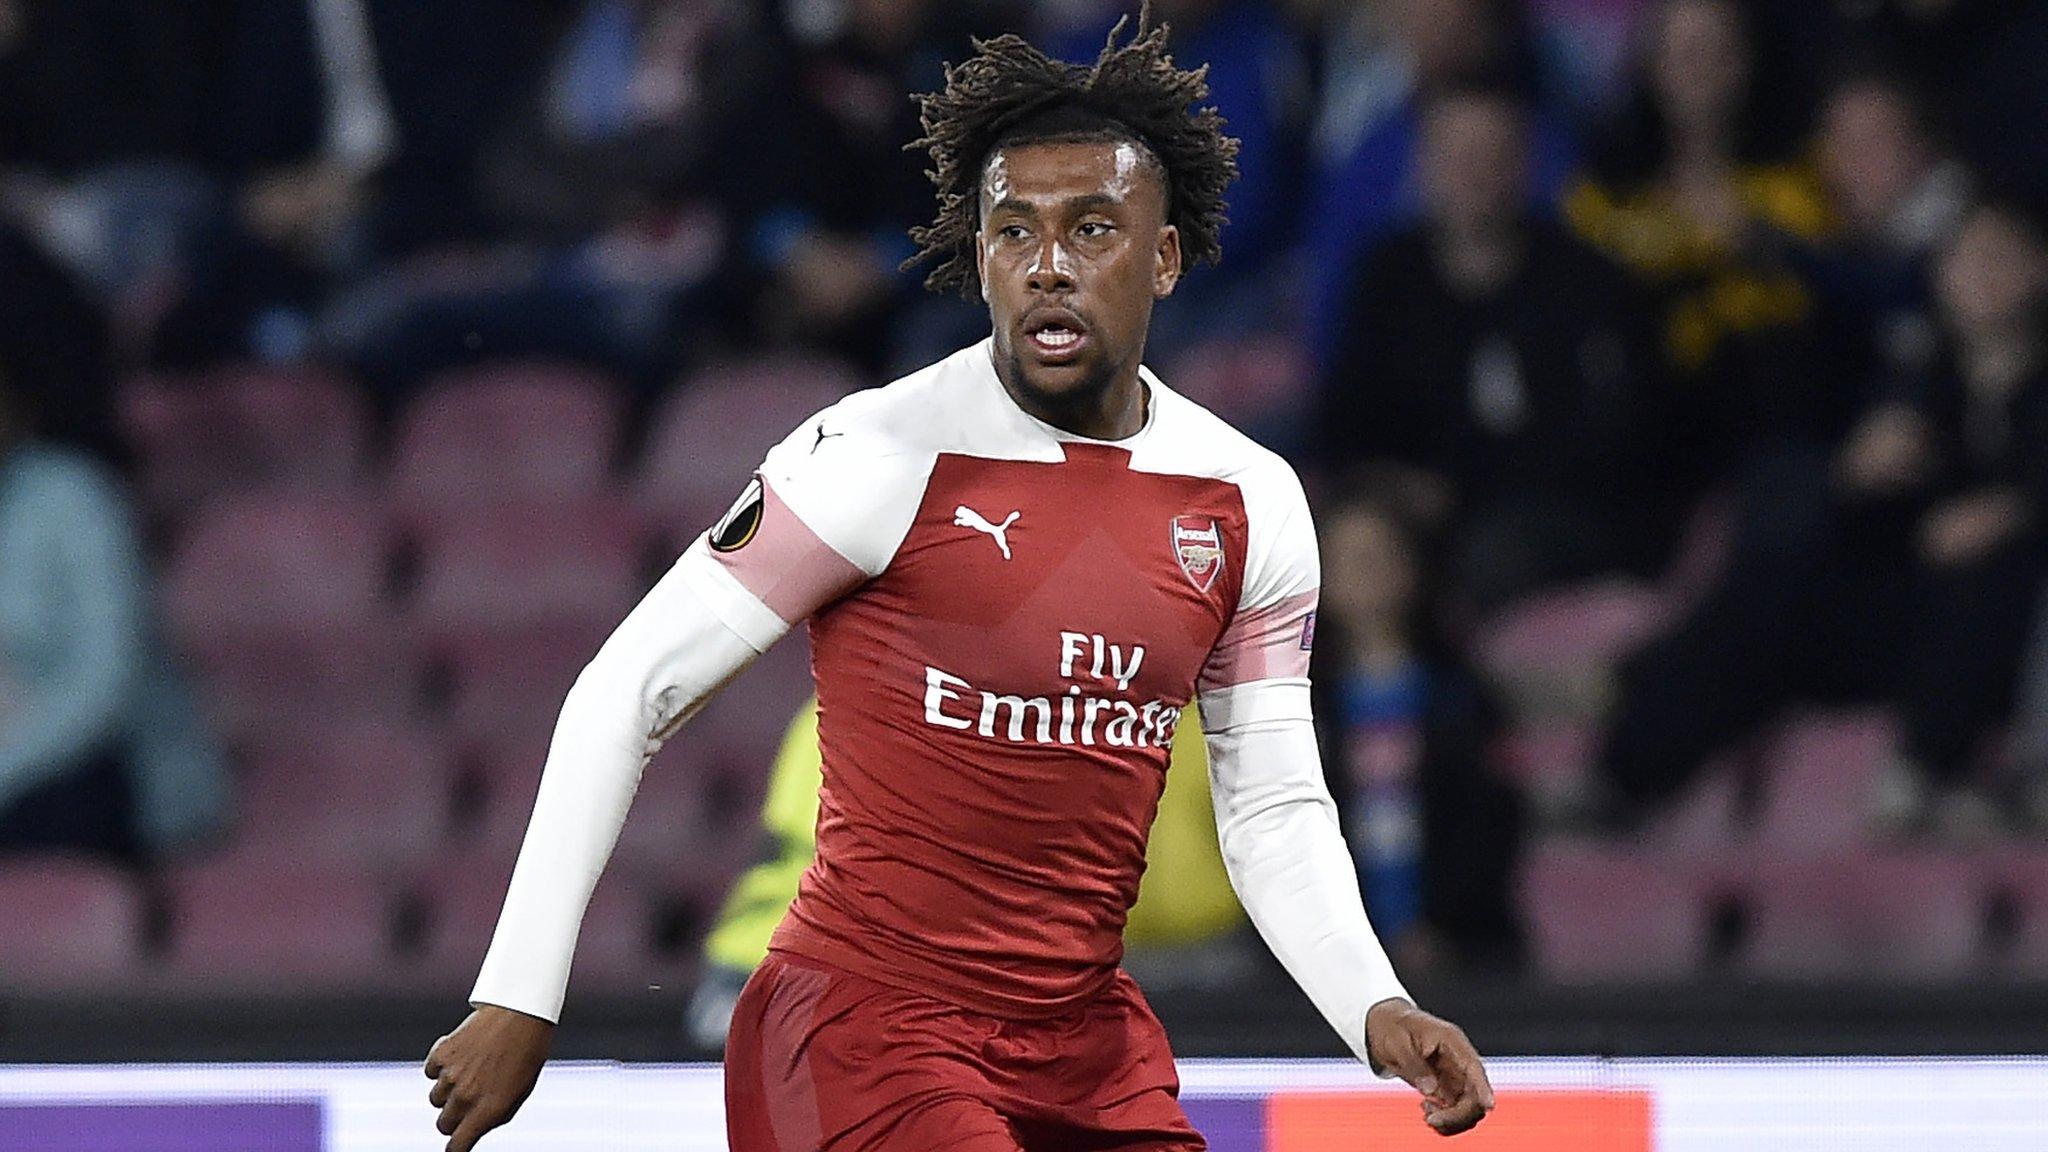 Arsenal's Alex Iwobi hoping to emulate uncle Jay-Jay Okocha's success